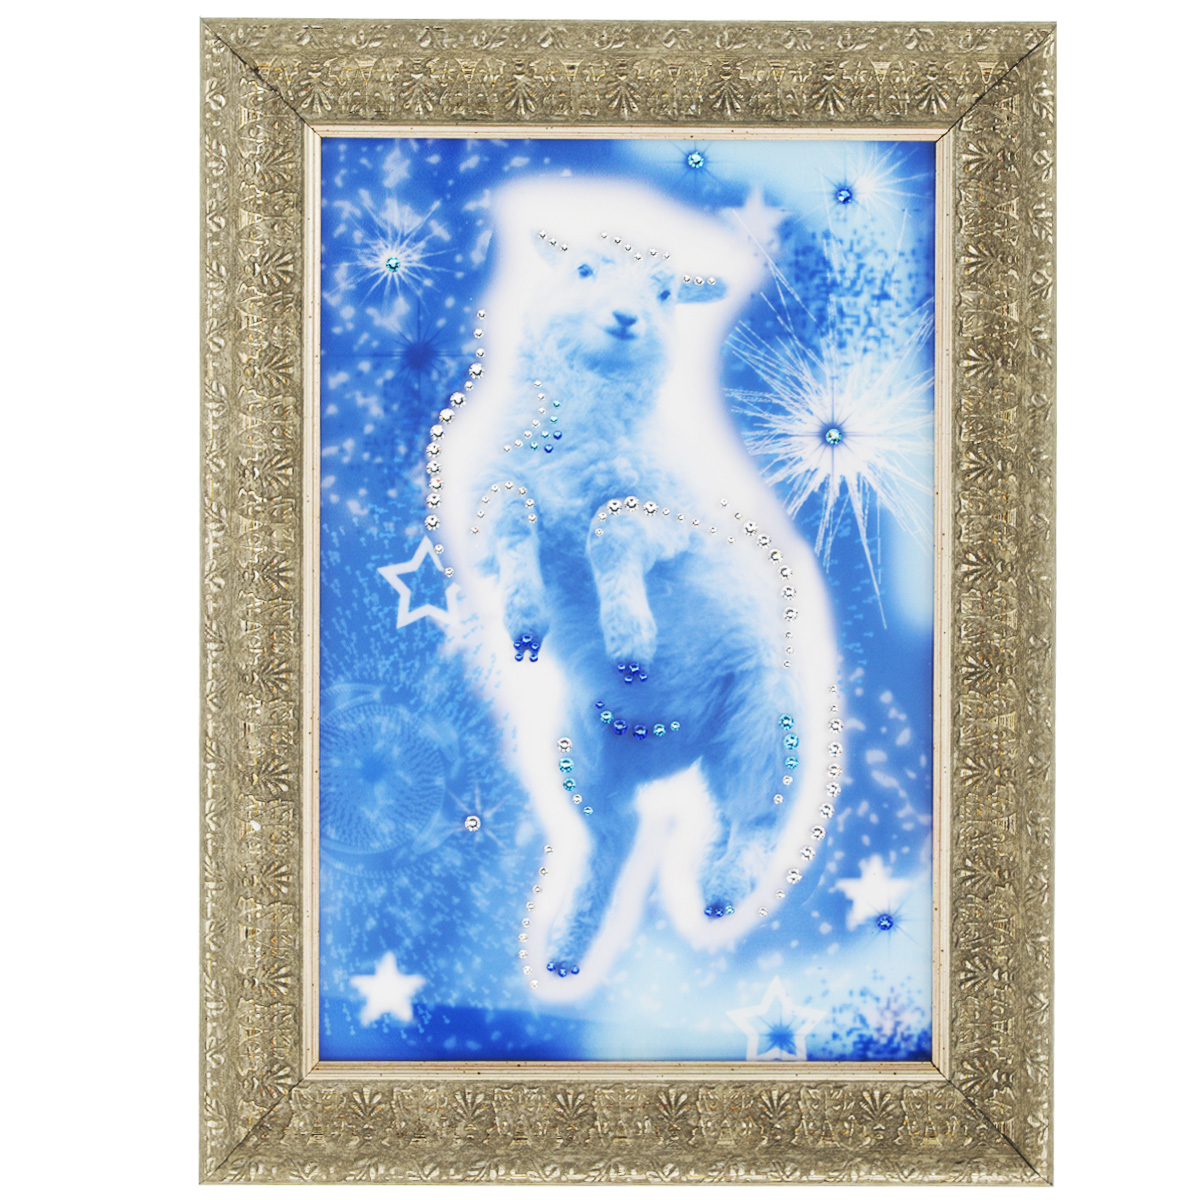 Картина с кристаллами Swarovski Звездная овечка, 29 х 39 см картины в квартиру картина etude 2 102х130 см